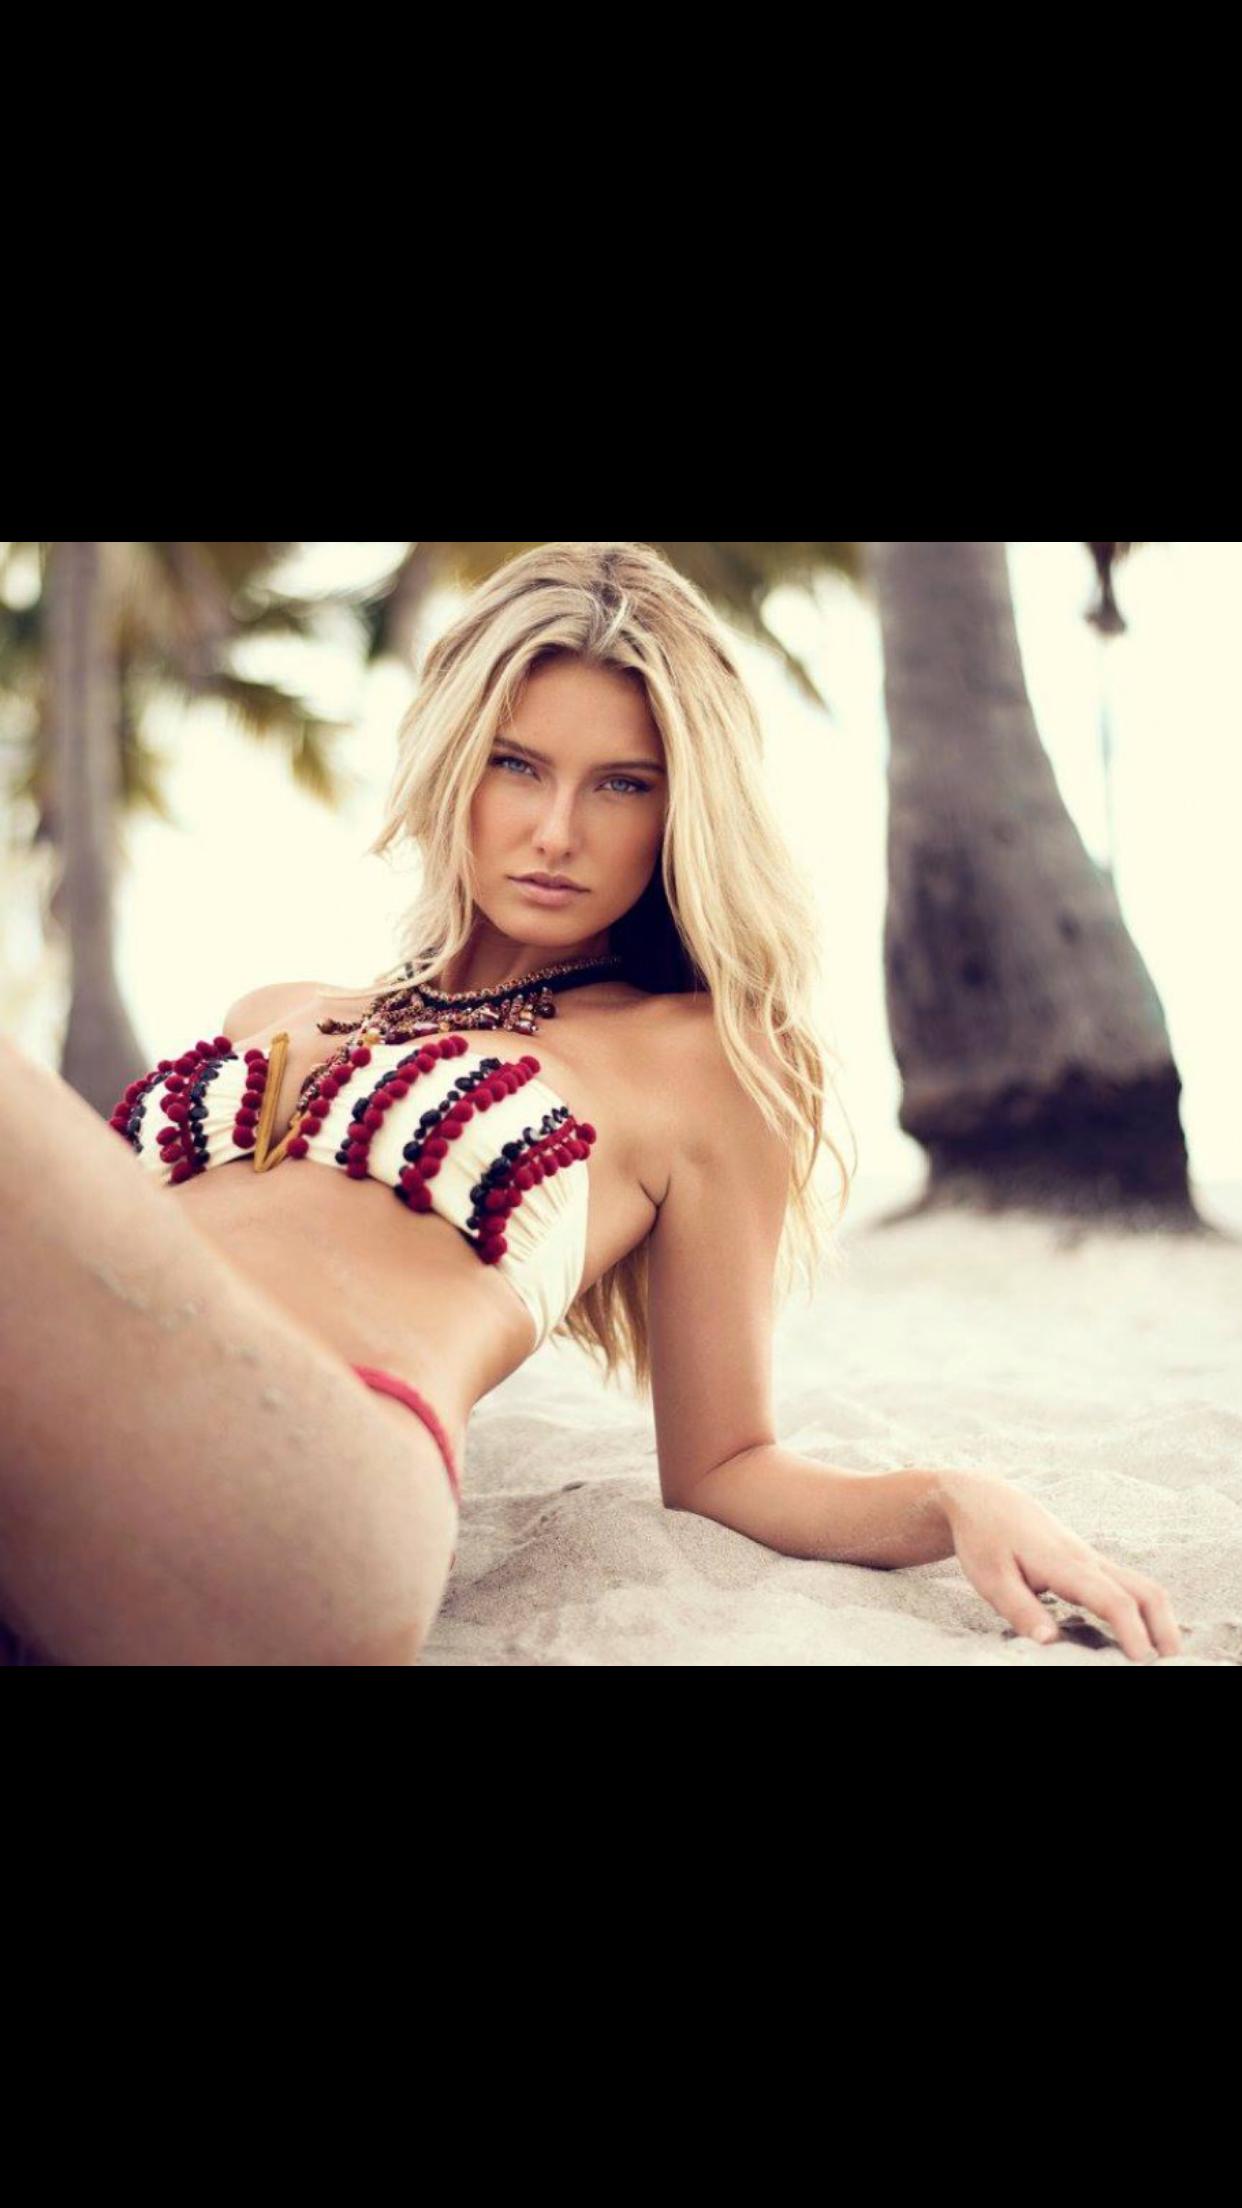 Bikini Ilona Kotelyukh nude photos 2019